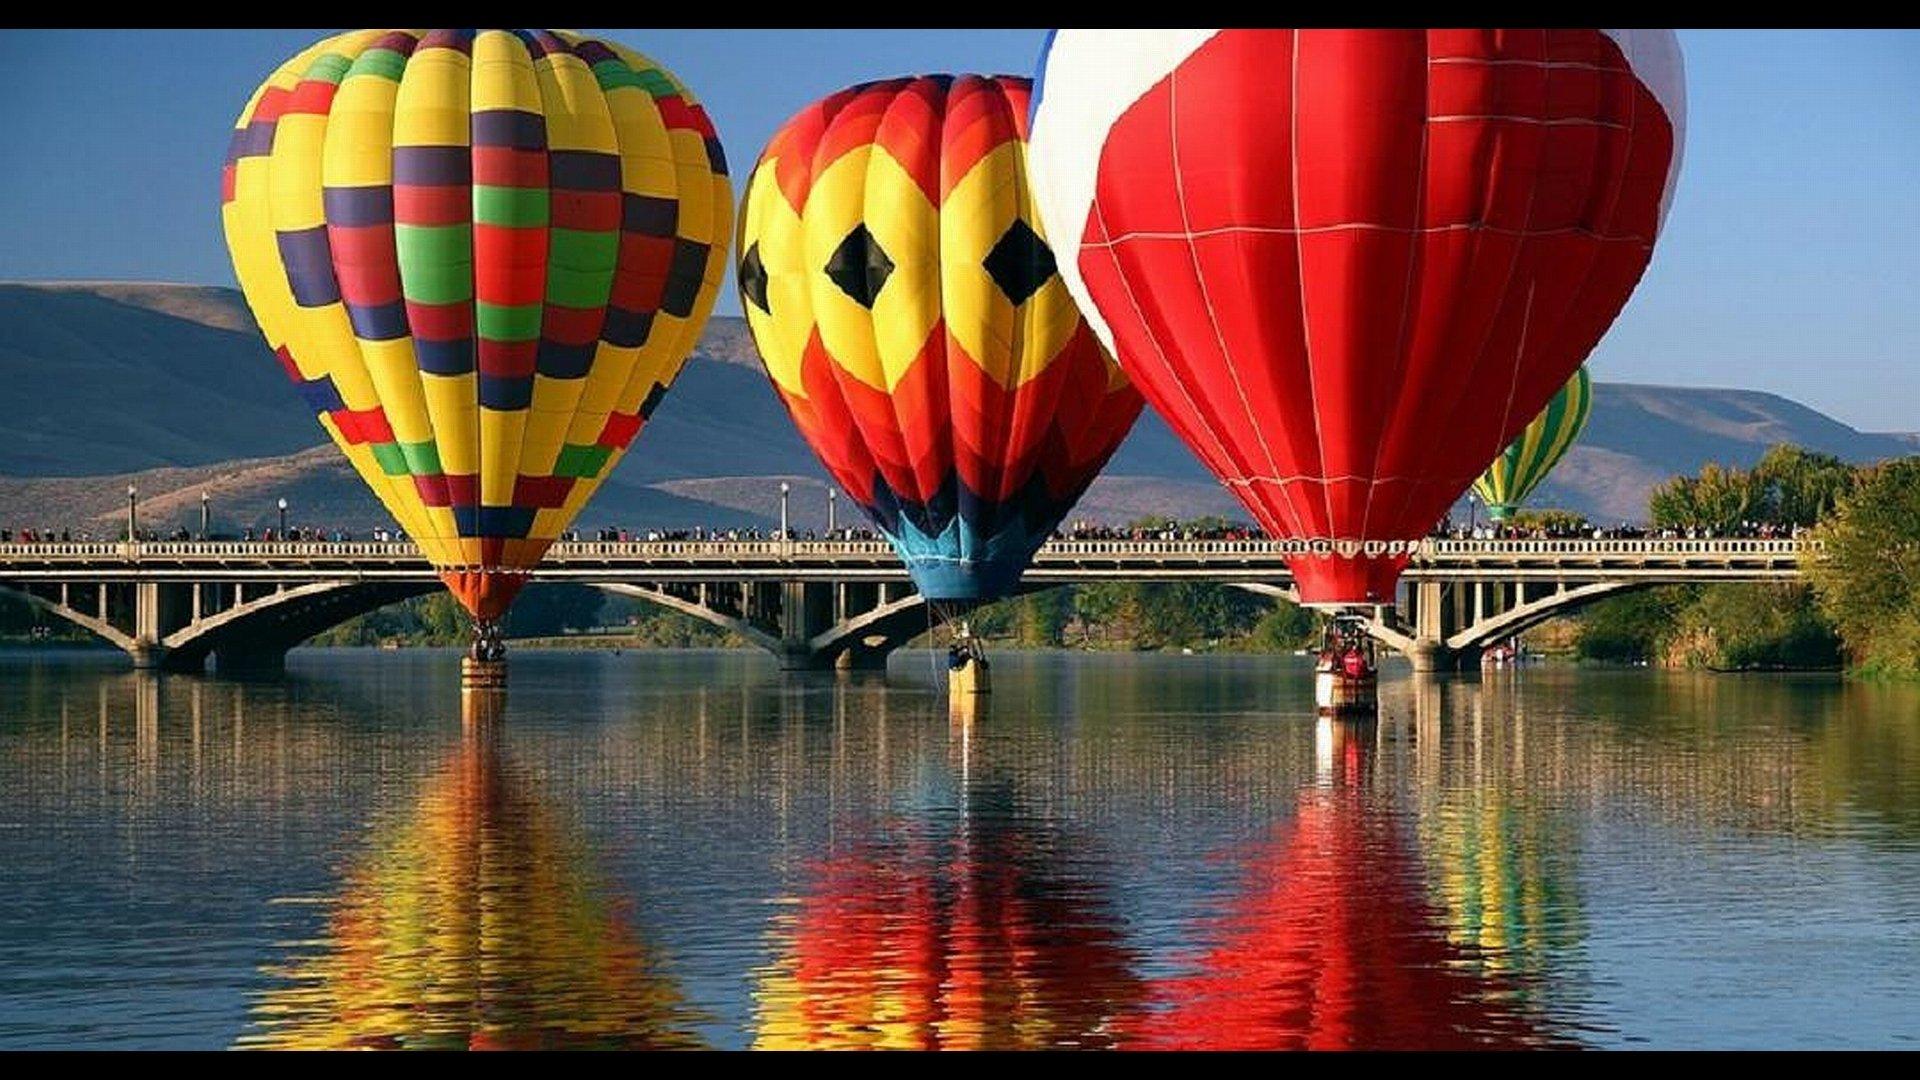 4k Fall Wallpaper Hot Air Balloon Full Hd Wallpaper And Background Image